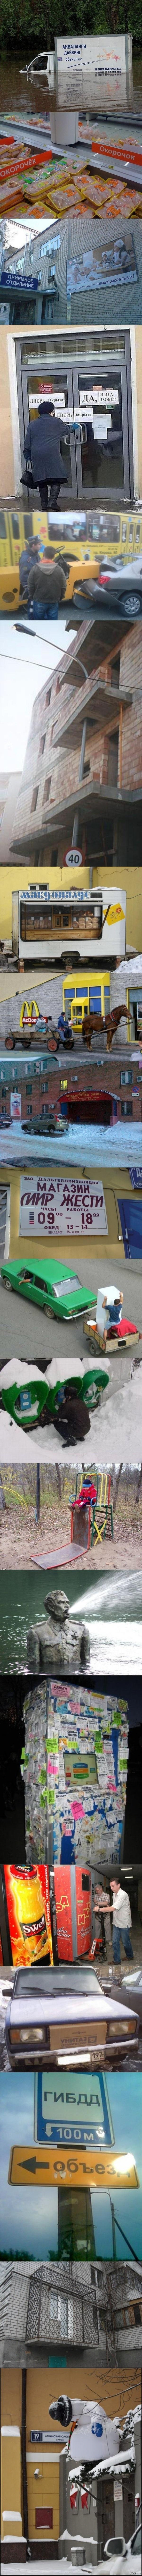 "Meanwhile in Russia (Выпуск 29) Двадцать восьмой выпуск: <a href=""http://pikabu.ru/story/meanwhile_in_russia_vyipusk_28_2940246"">http://pikabu.ru/story/_2940246</a>"